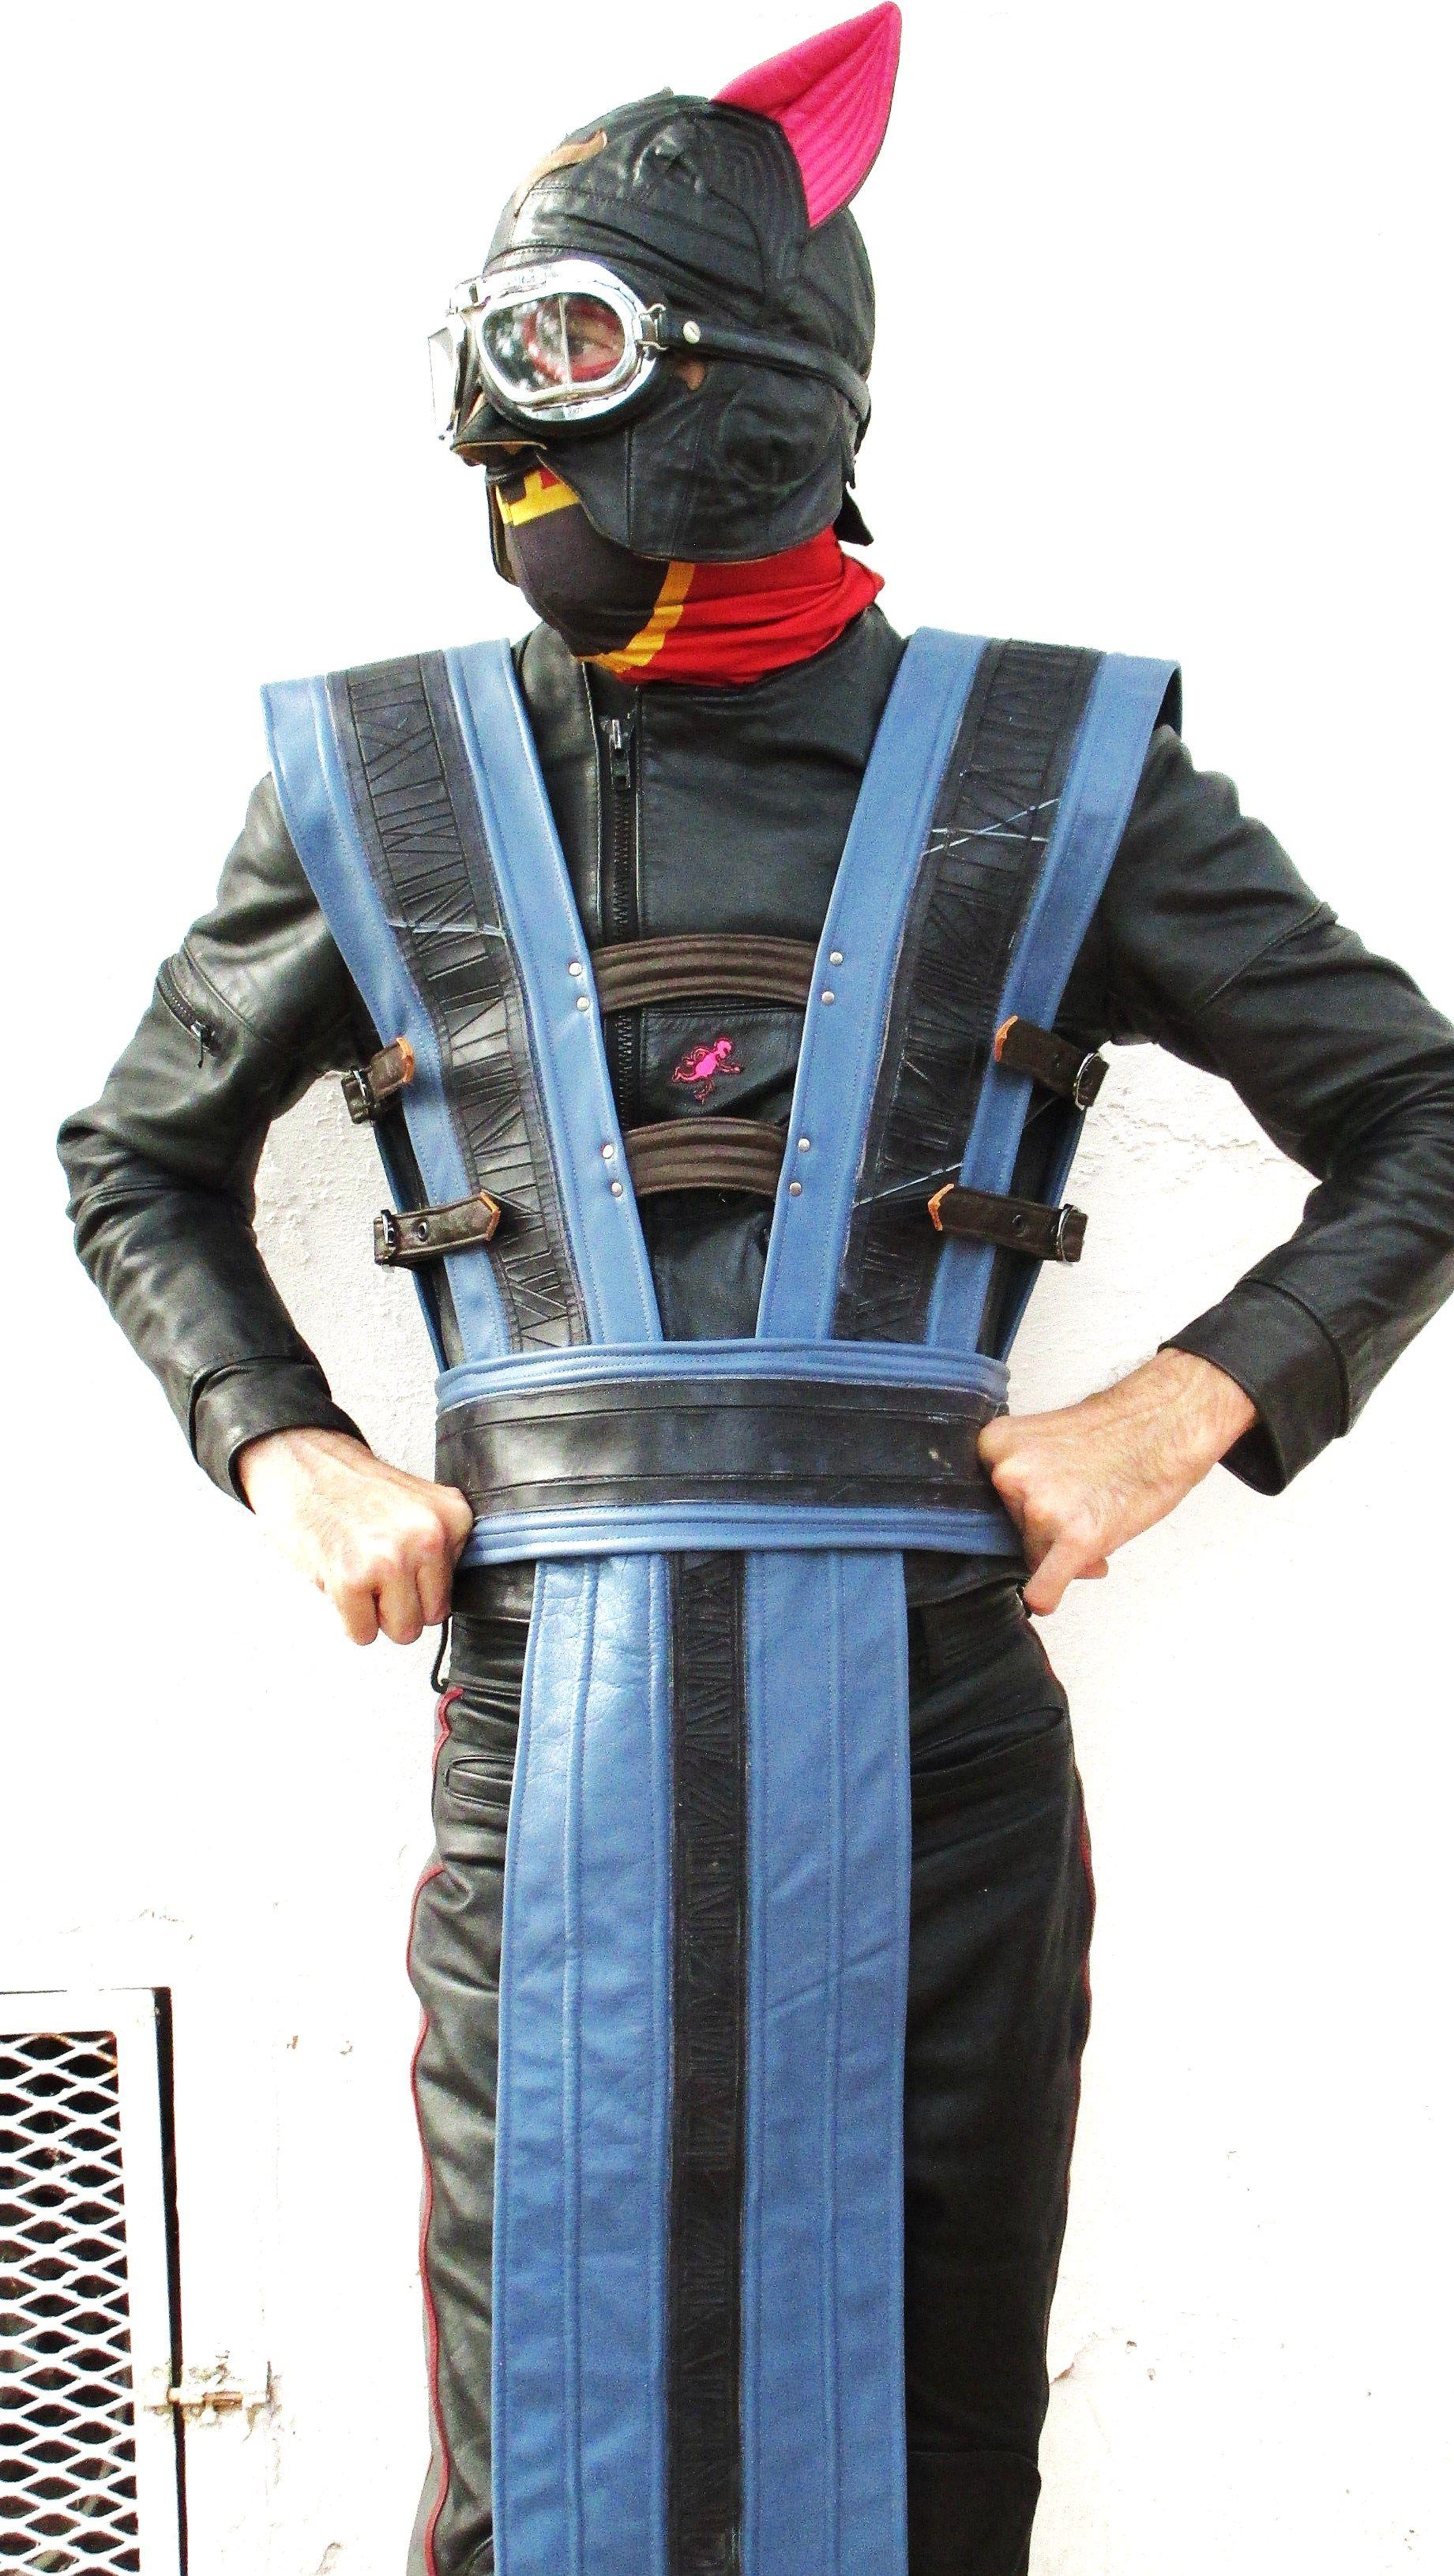 Kitty Ear Mask/ Goggles with Custom Leather Mortal Kombat Tabard